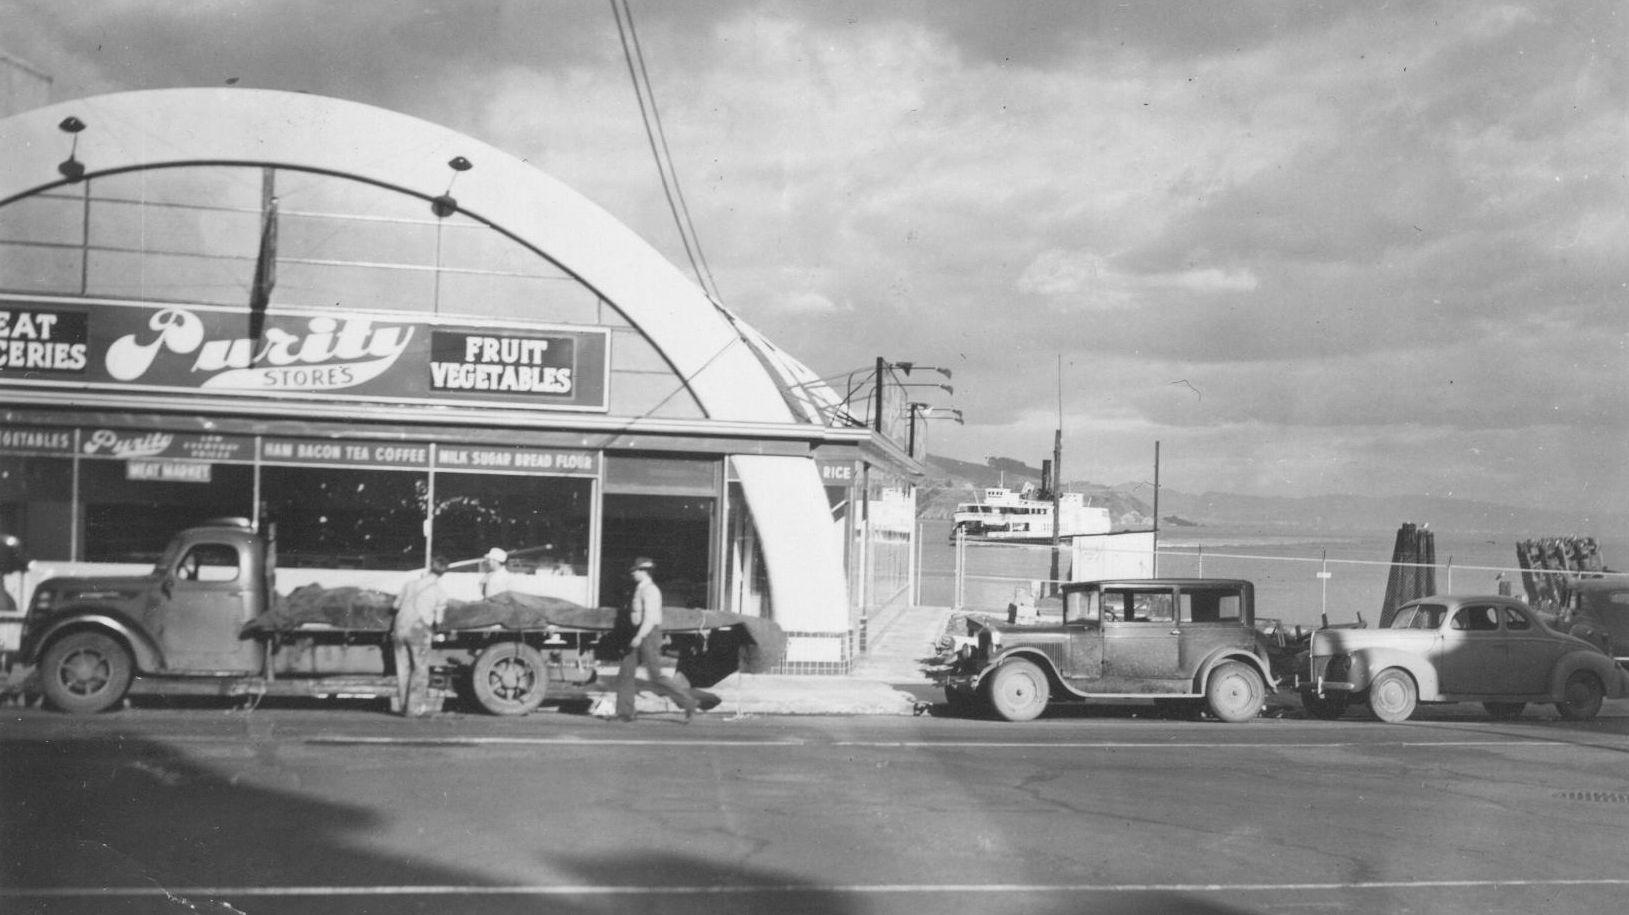 Purity Market in 1941         Photo courtesy of Sausalito Historical Society